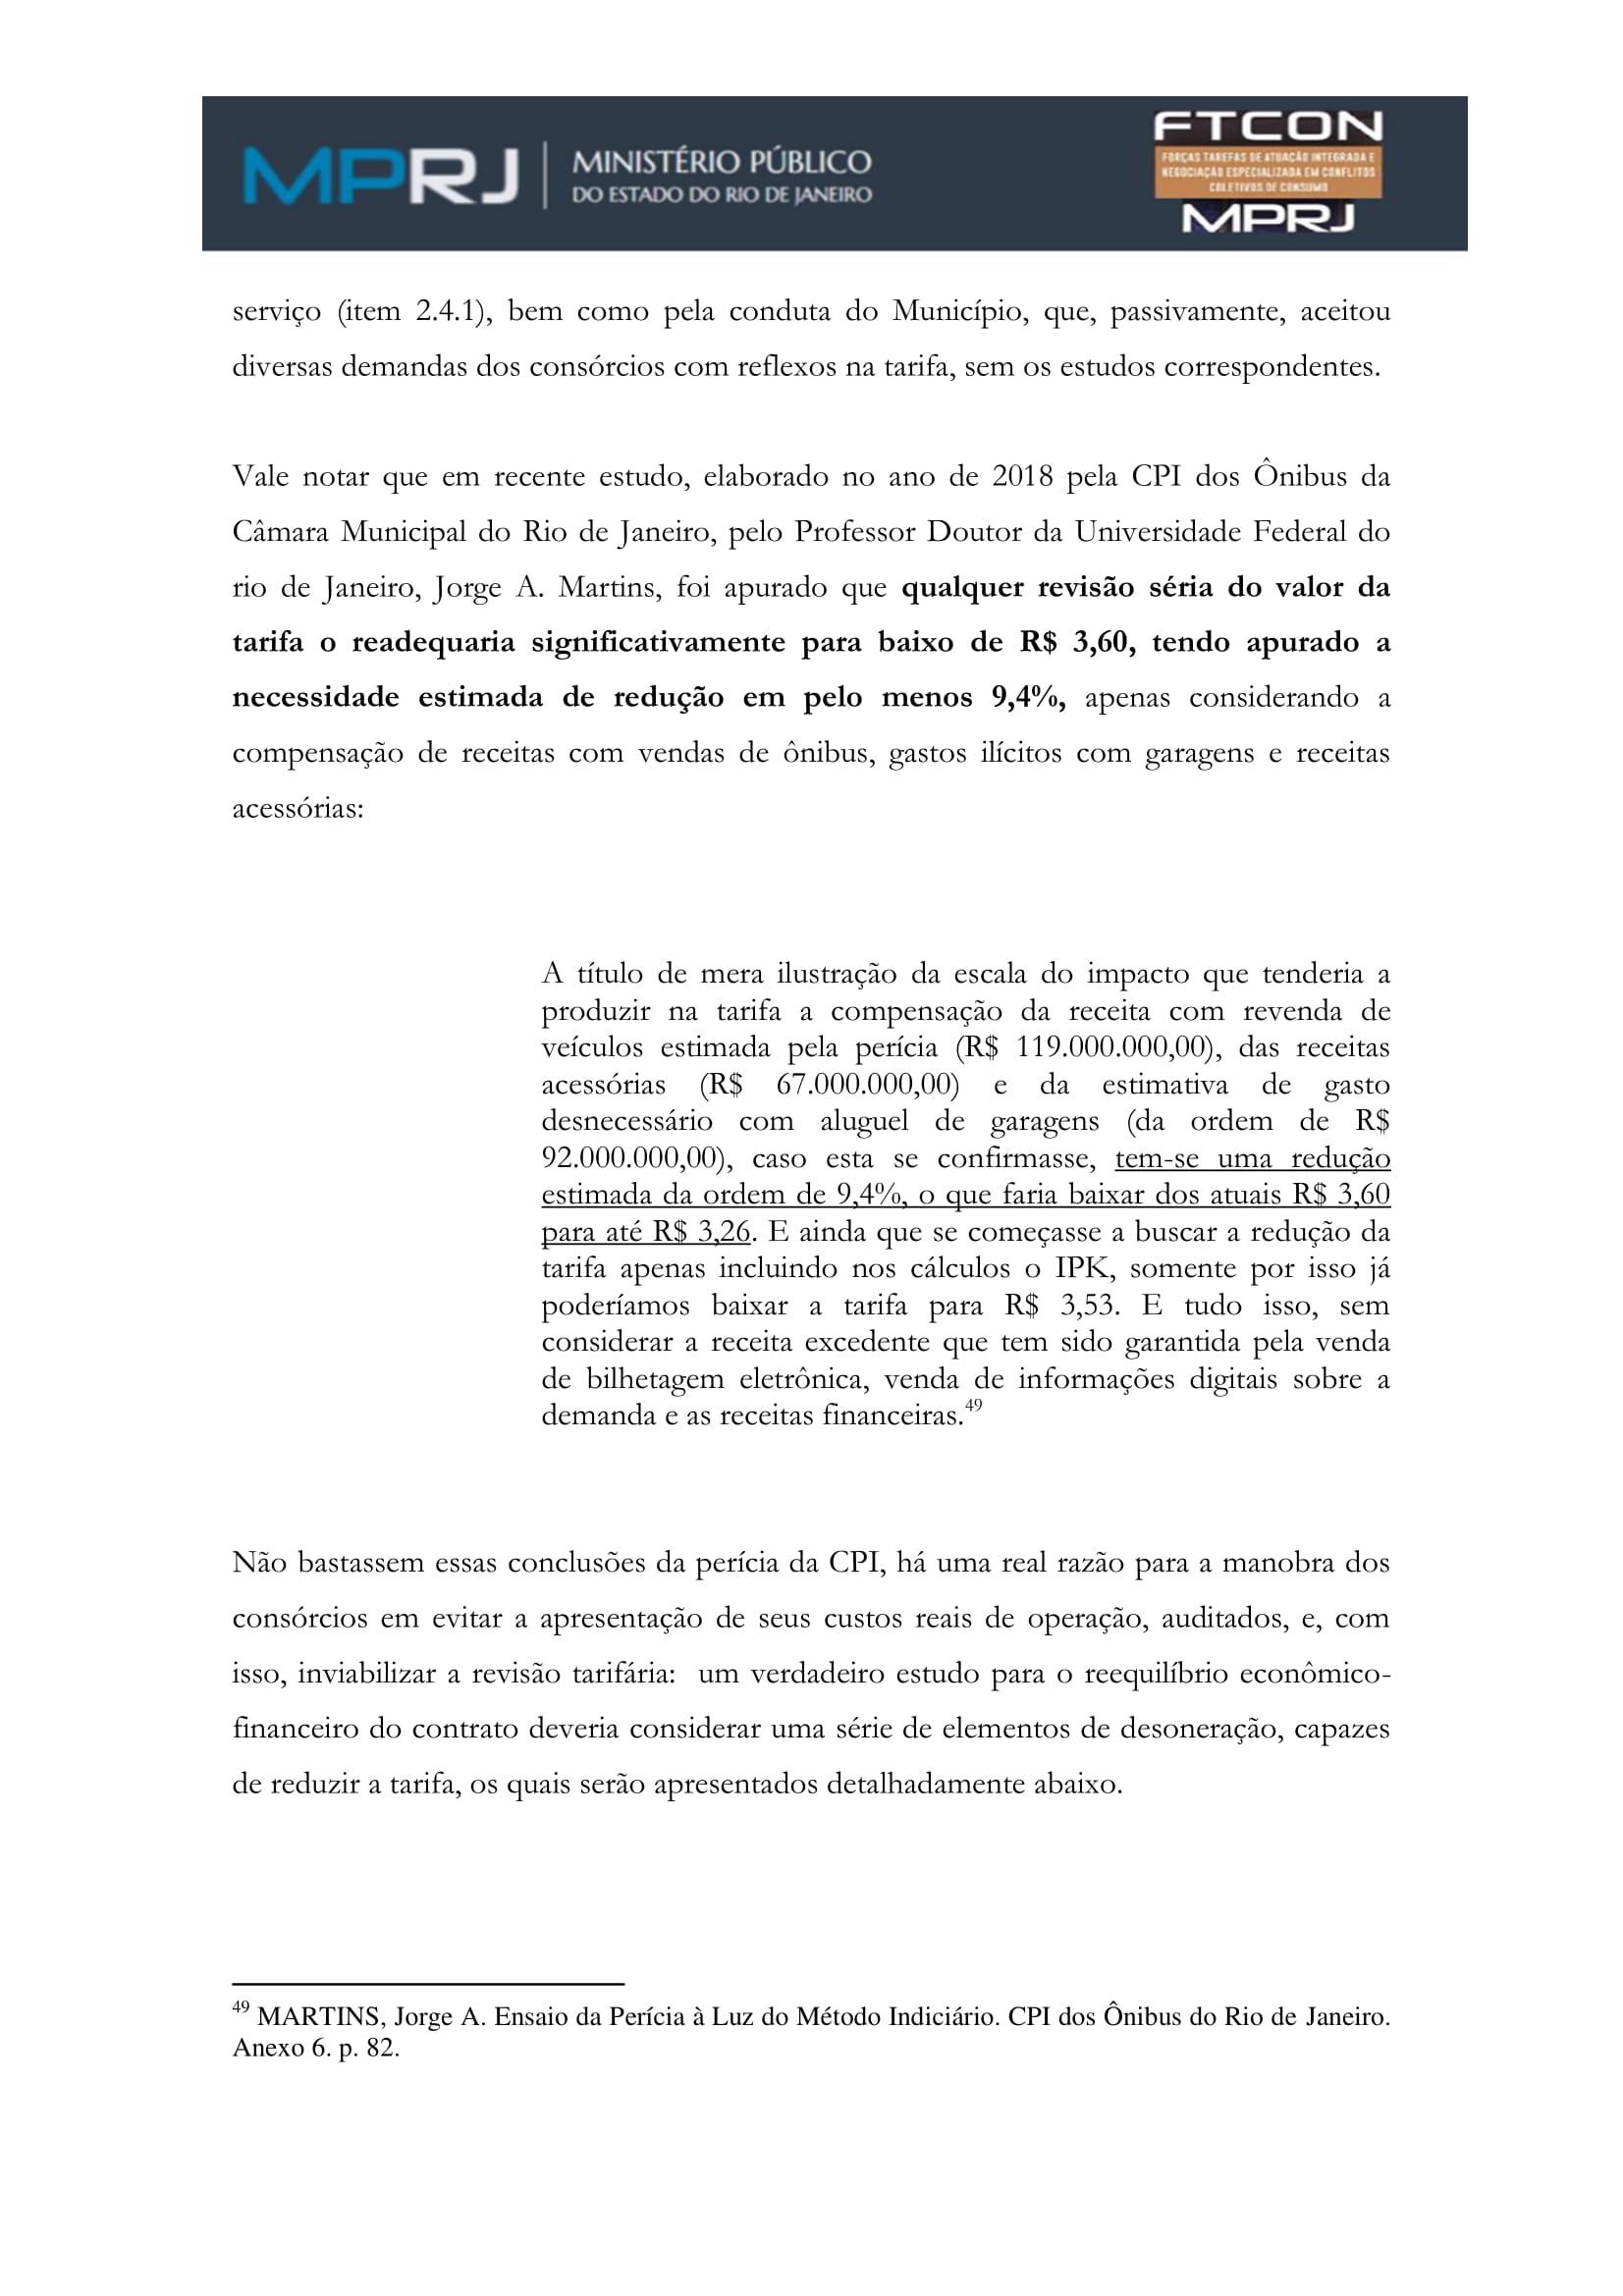 acp_caducidade_onibus_dr_rt-066